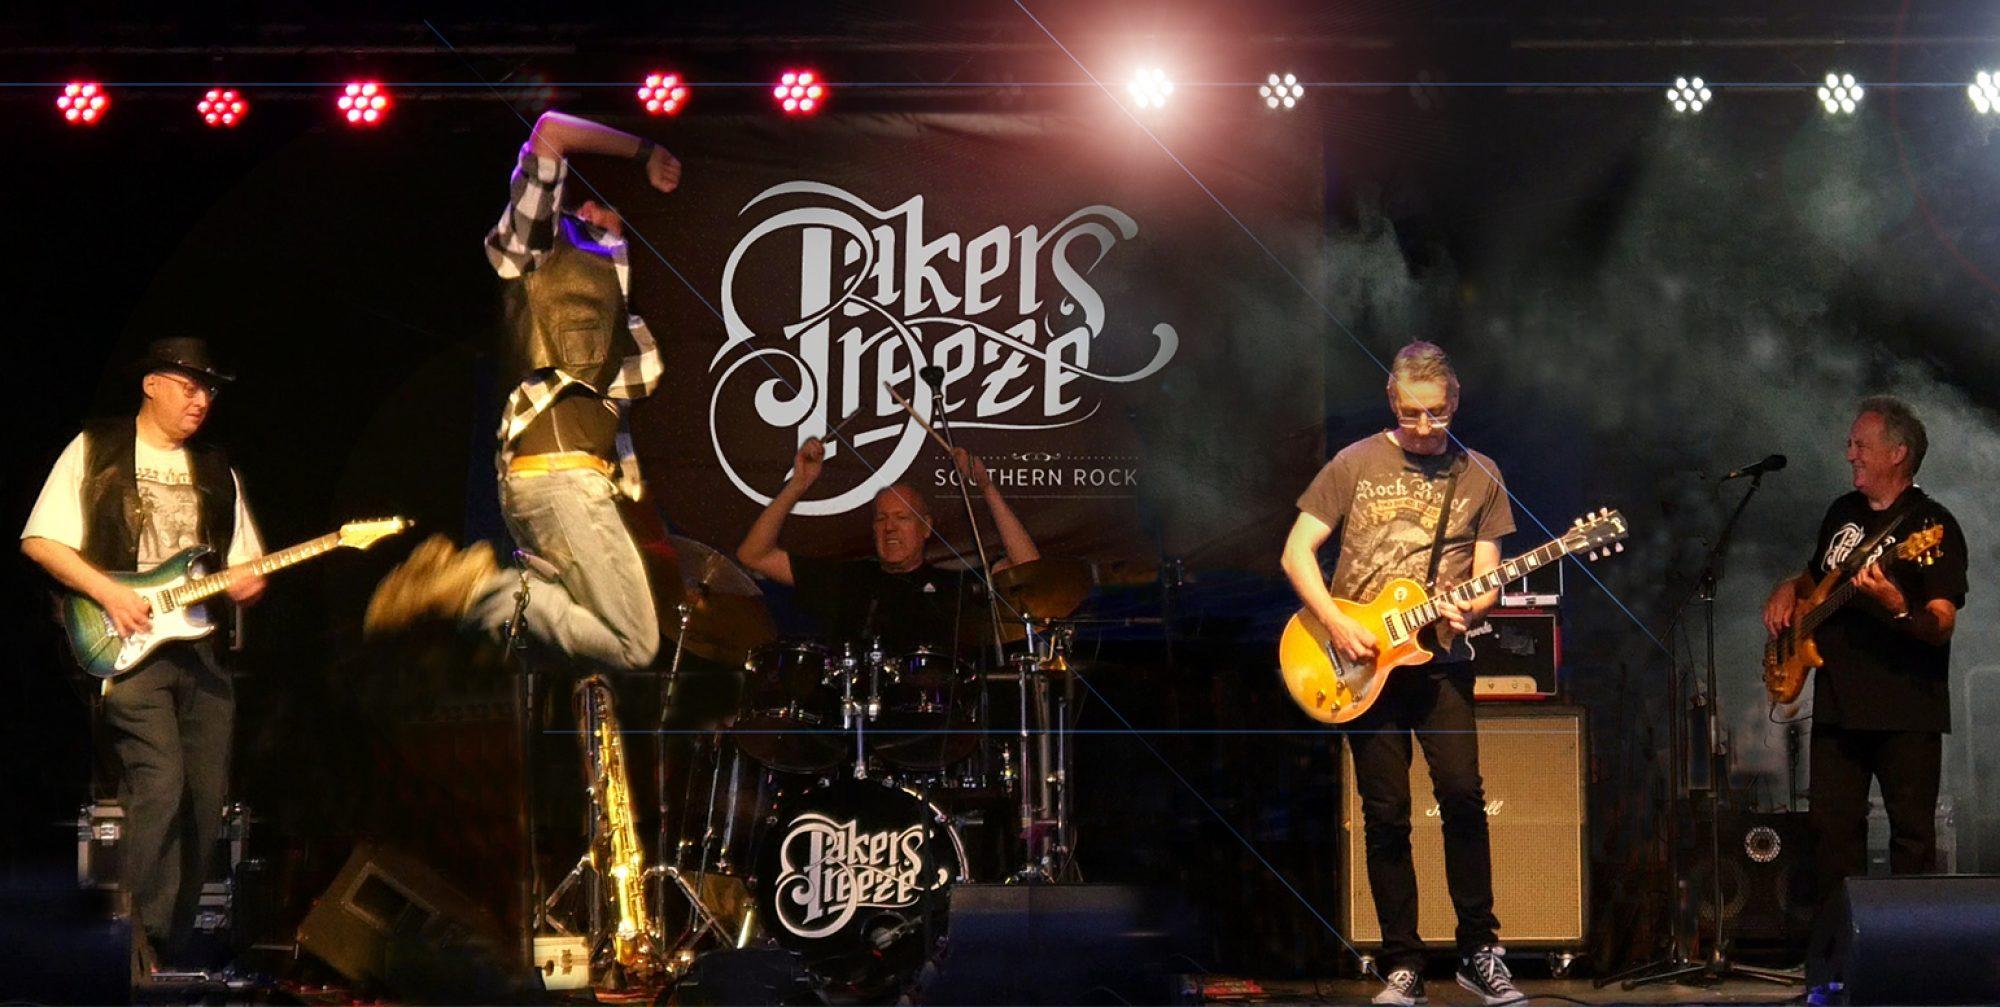 Baker's Breeze